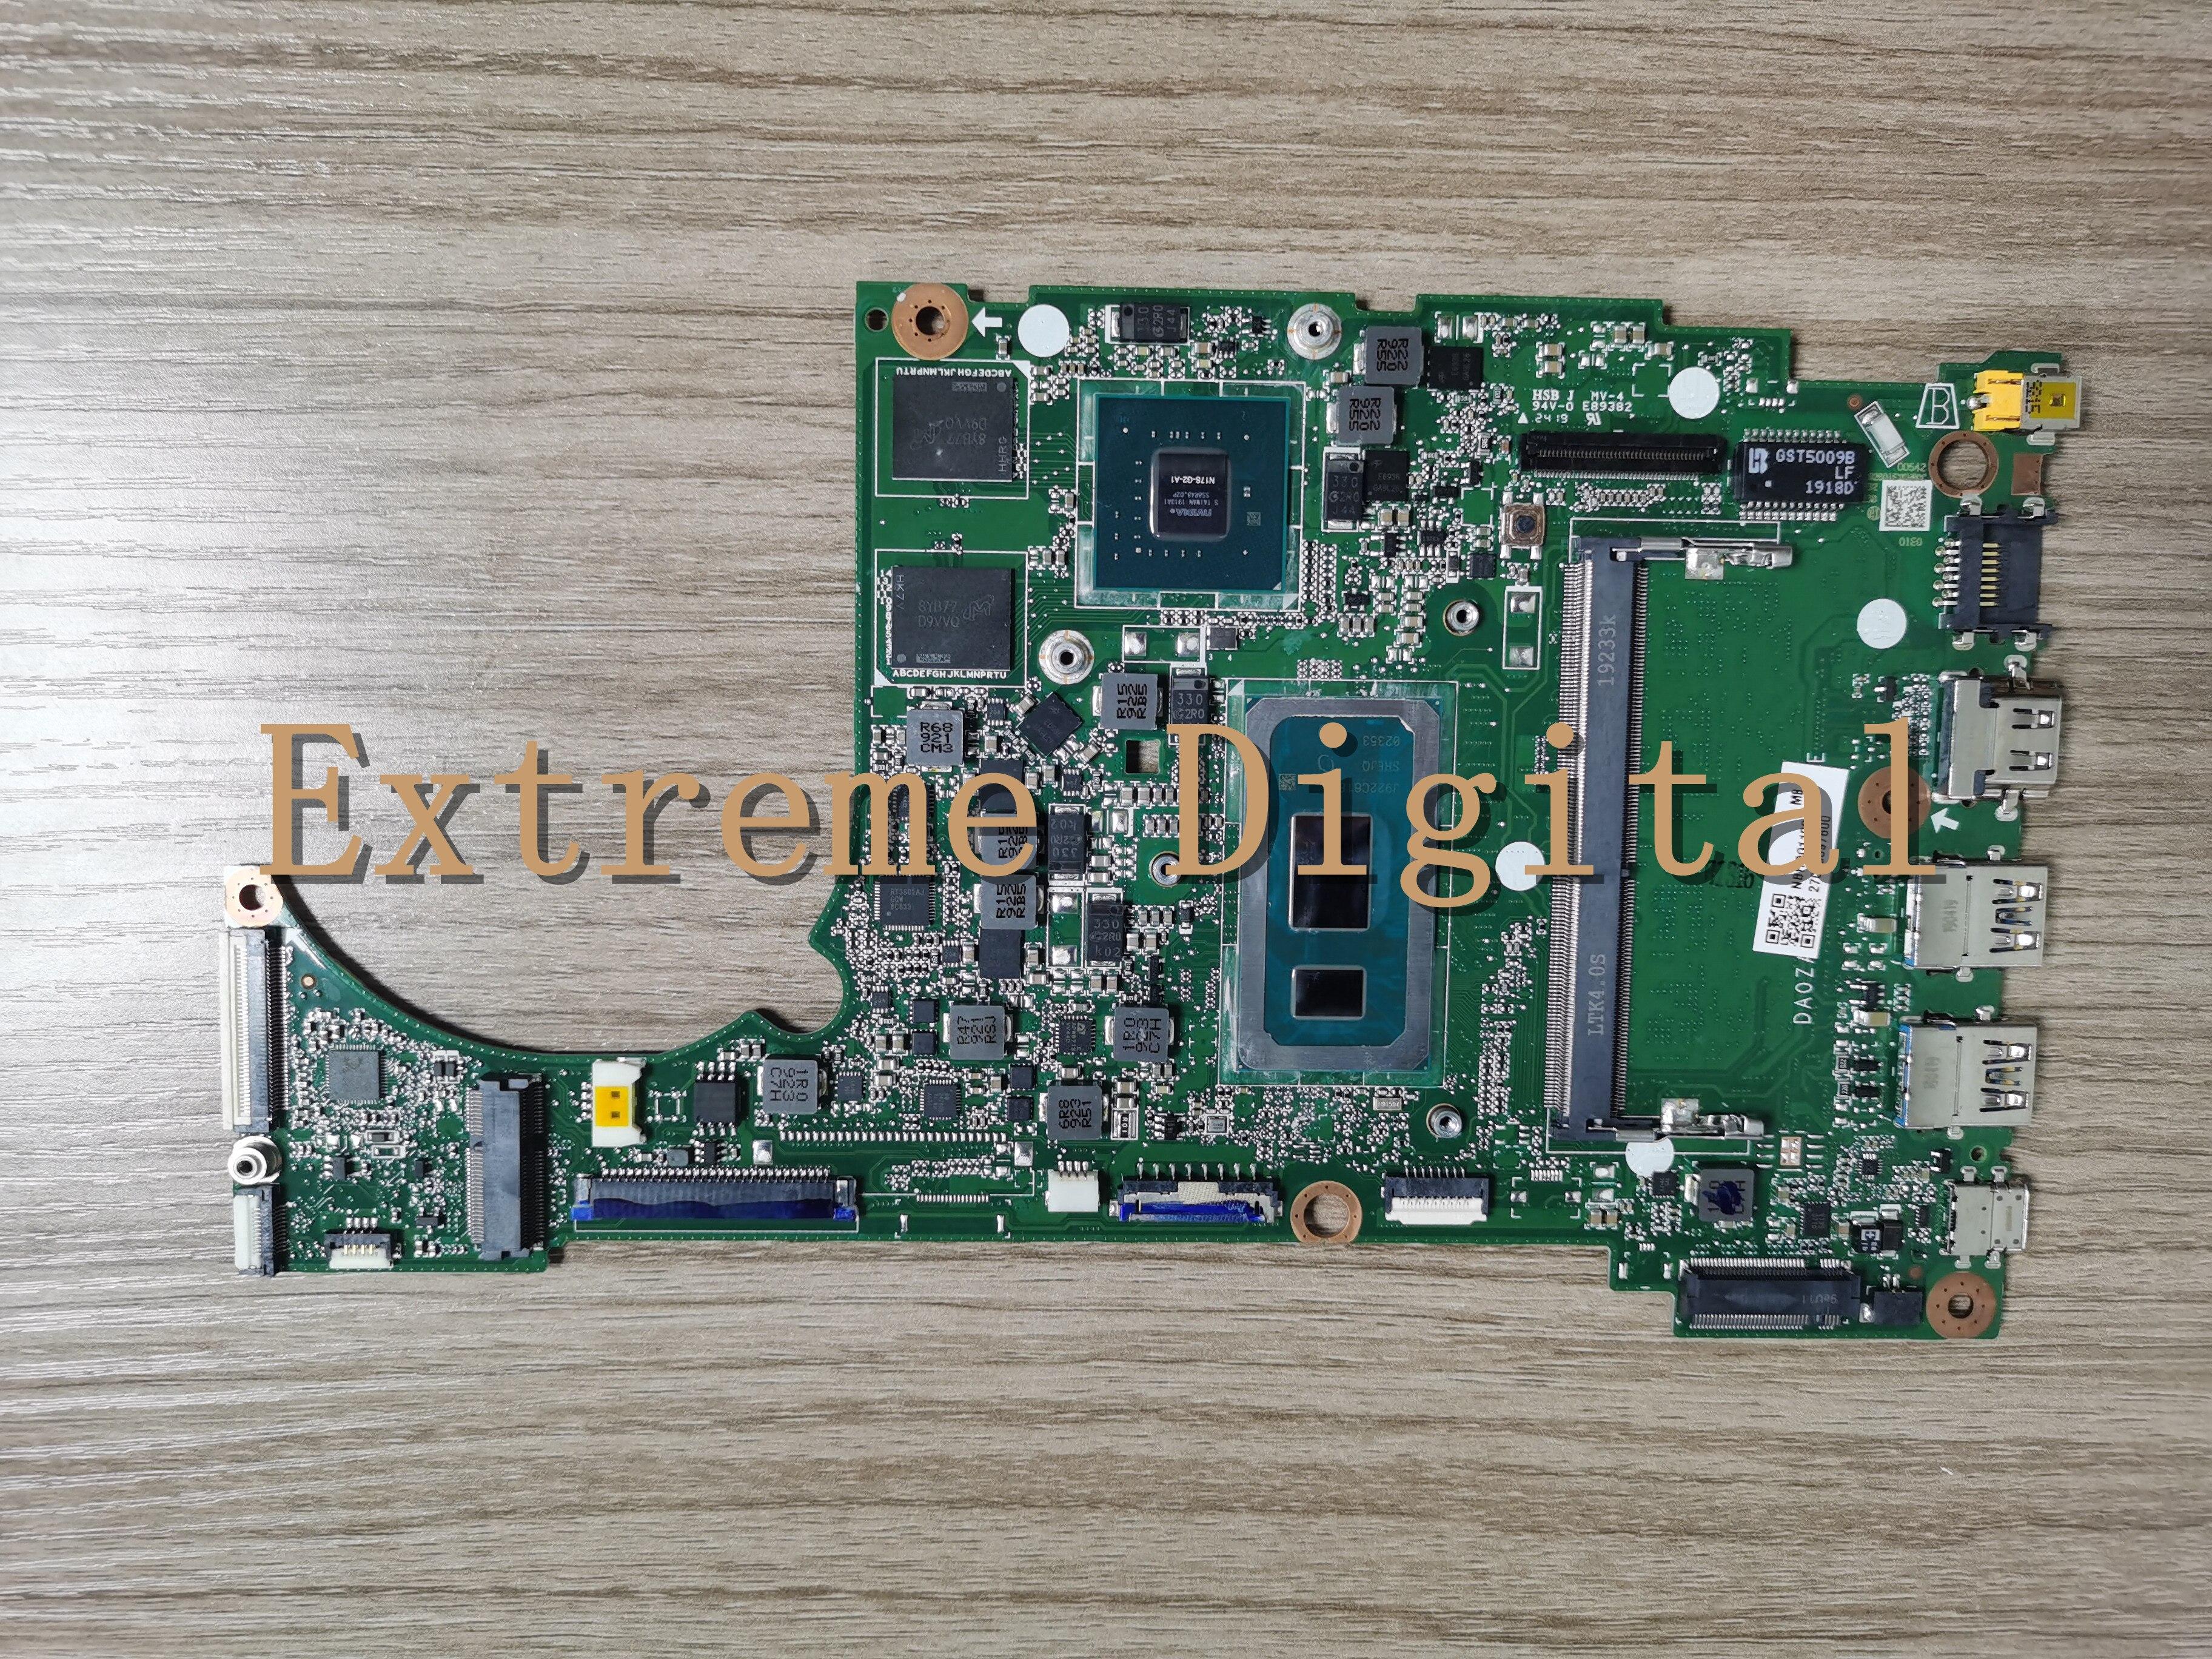 DA0ZAWMB8E0 Para ACER ASPIRE 5 A515-54 A315-55G NBHDG110019 motherboard com i5-8265U N17S-G2 2G laptop motherboard 100% testado